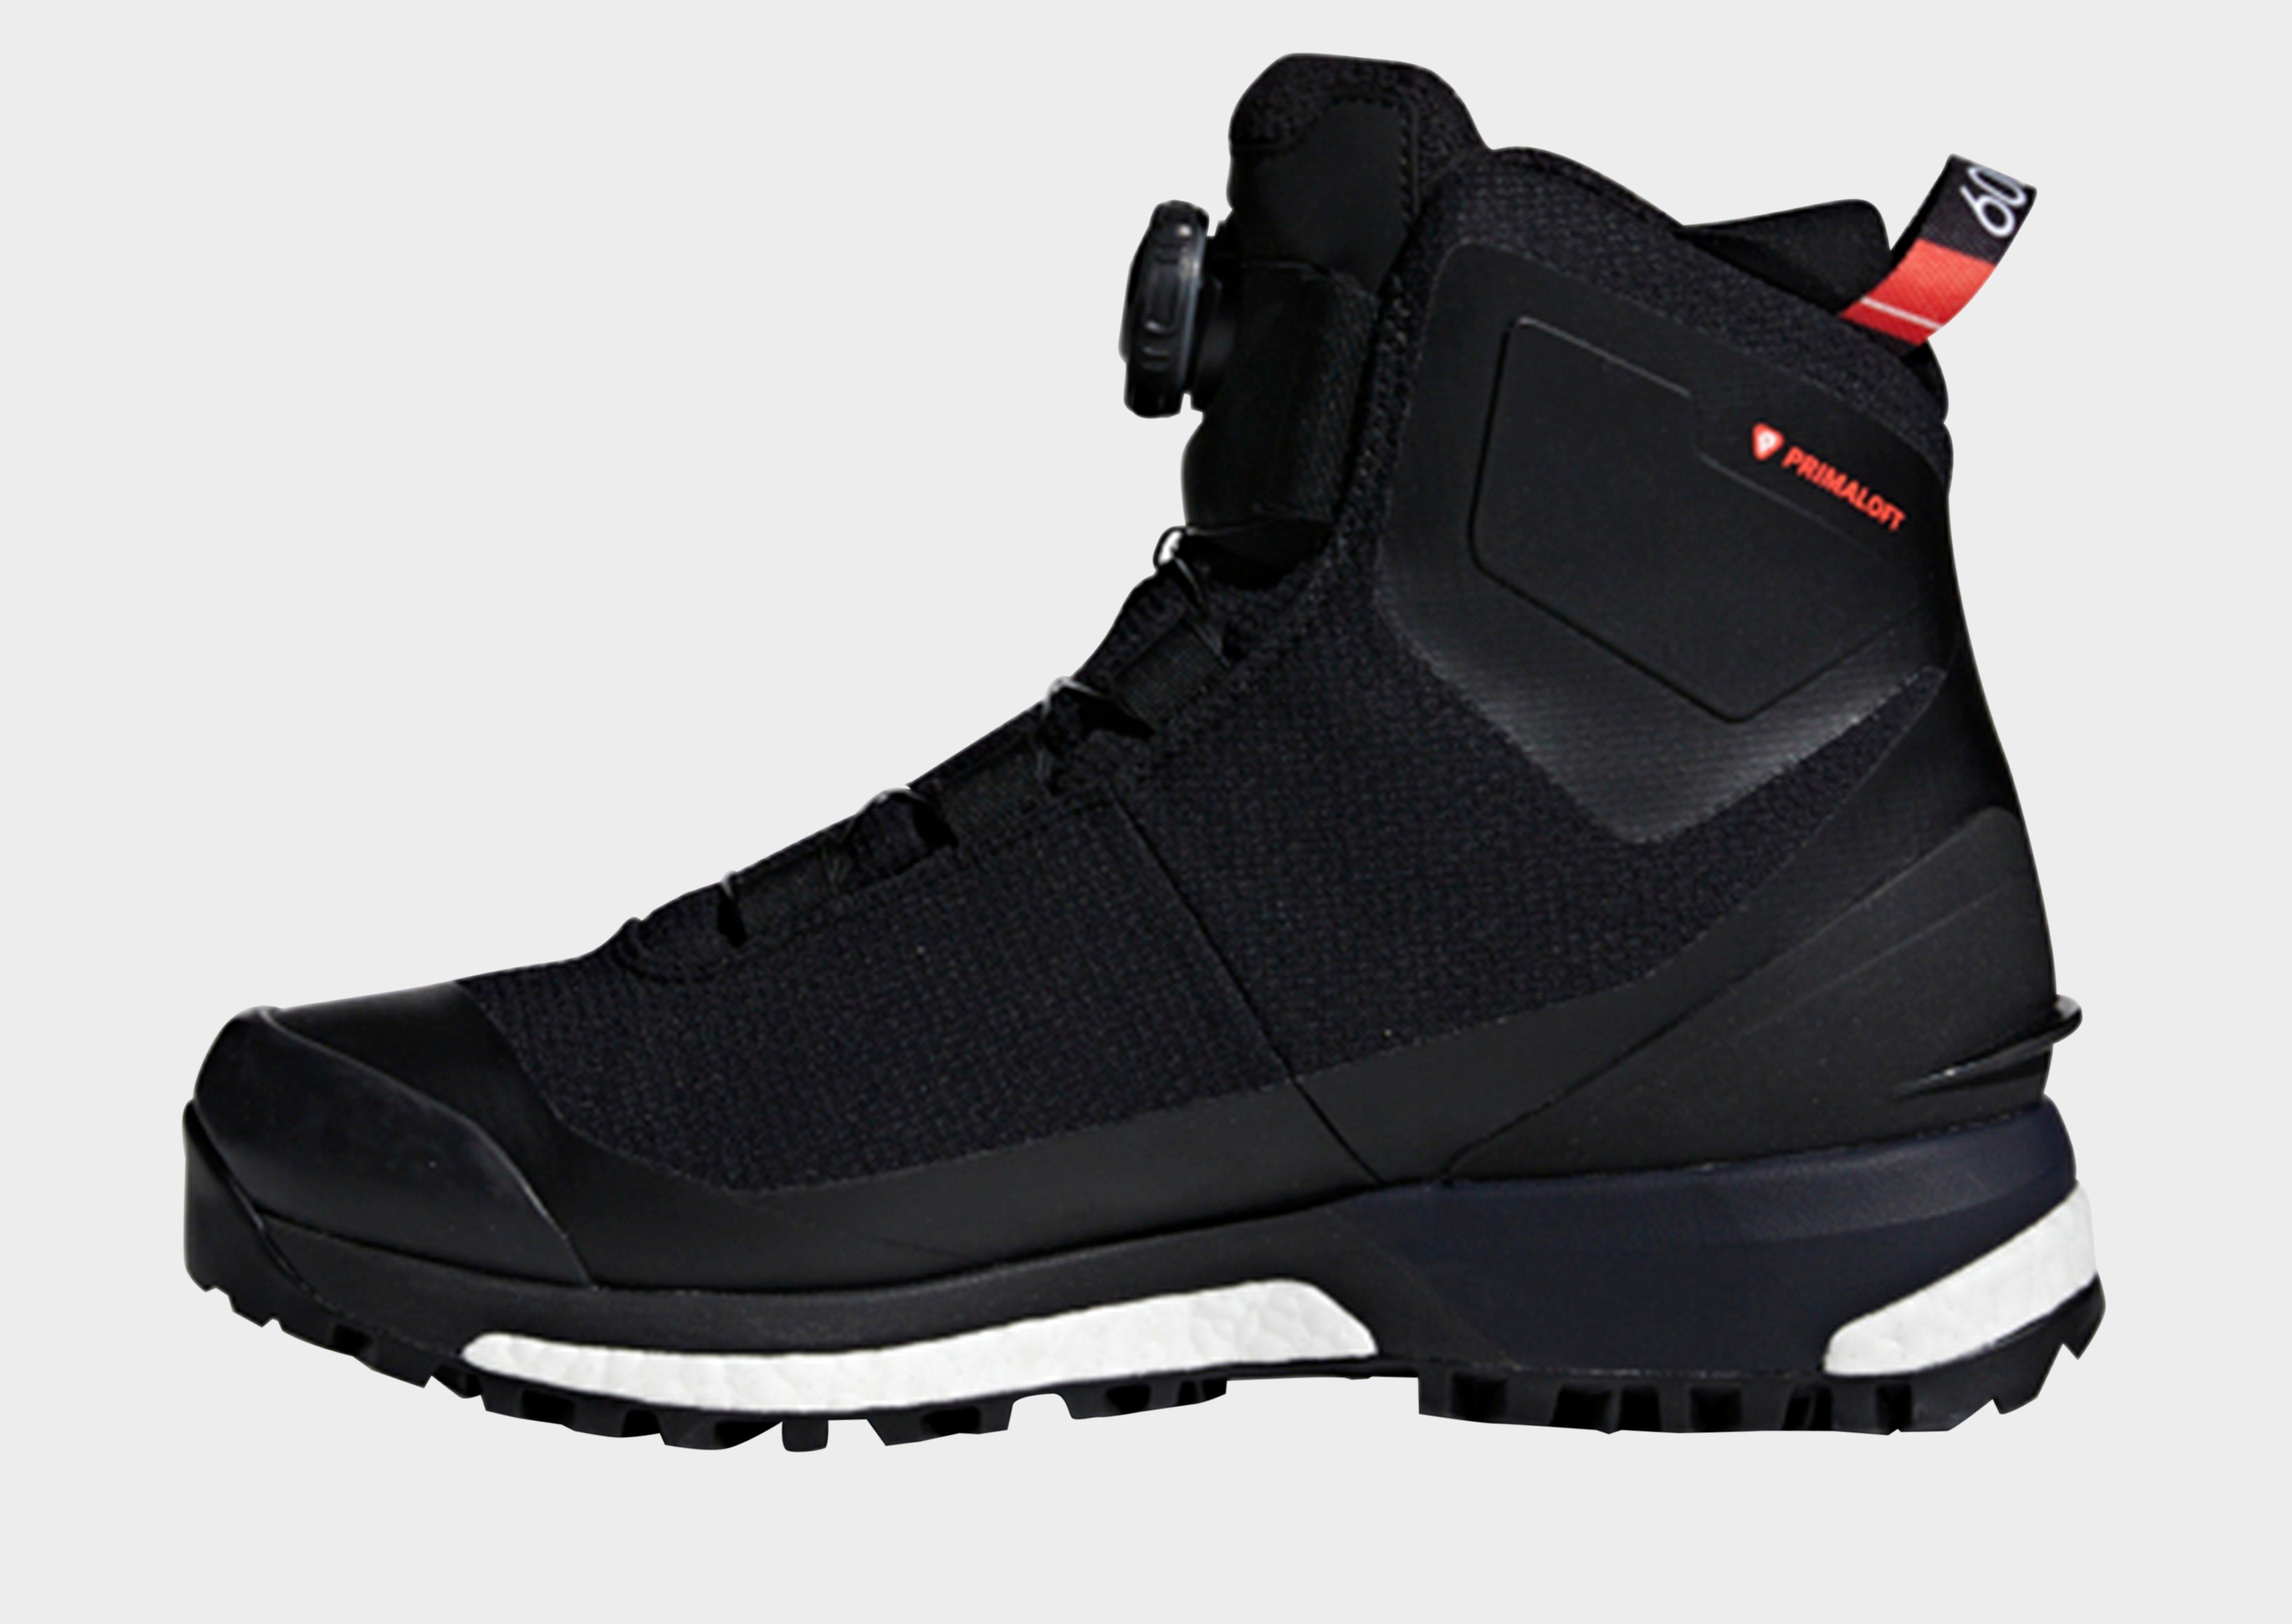 2ab2d00e9b4 Adidas Black Terrex Conrax Climaheat Boa Shoes for men